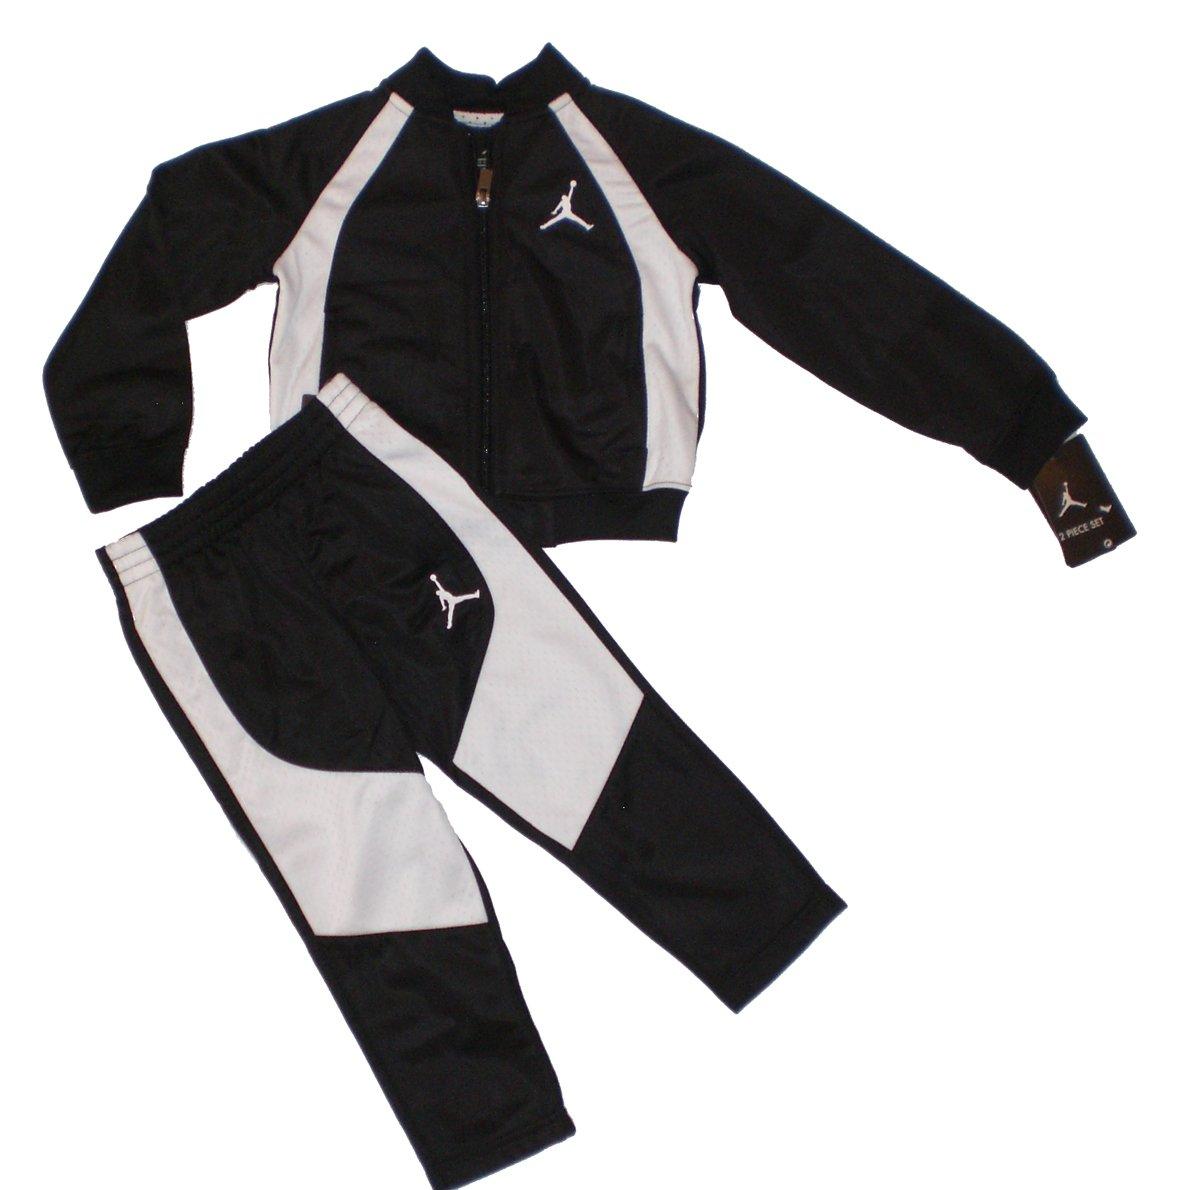 Jordan Jumpman Little Boy's Jacket